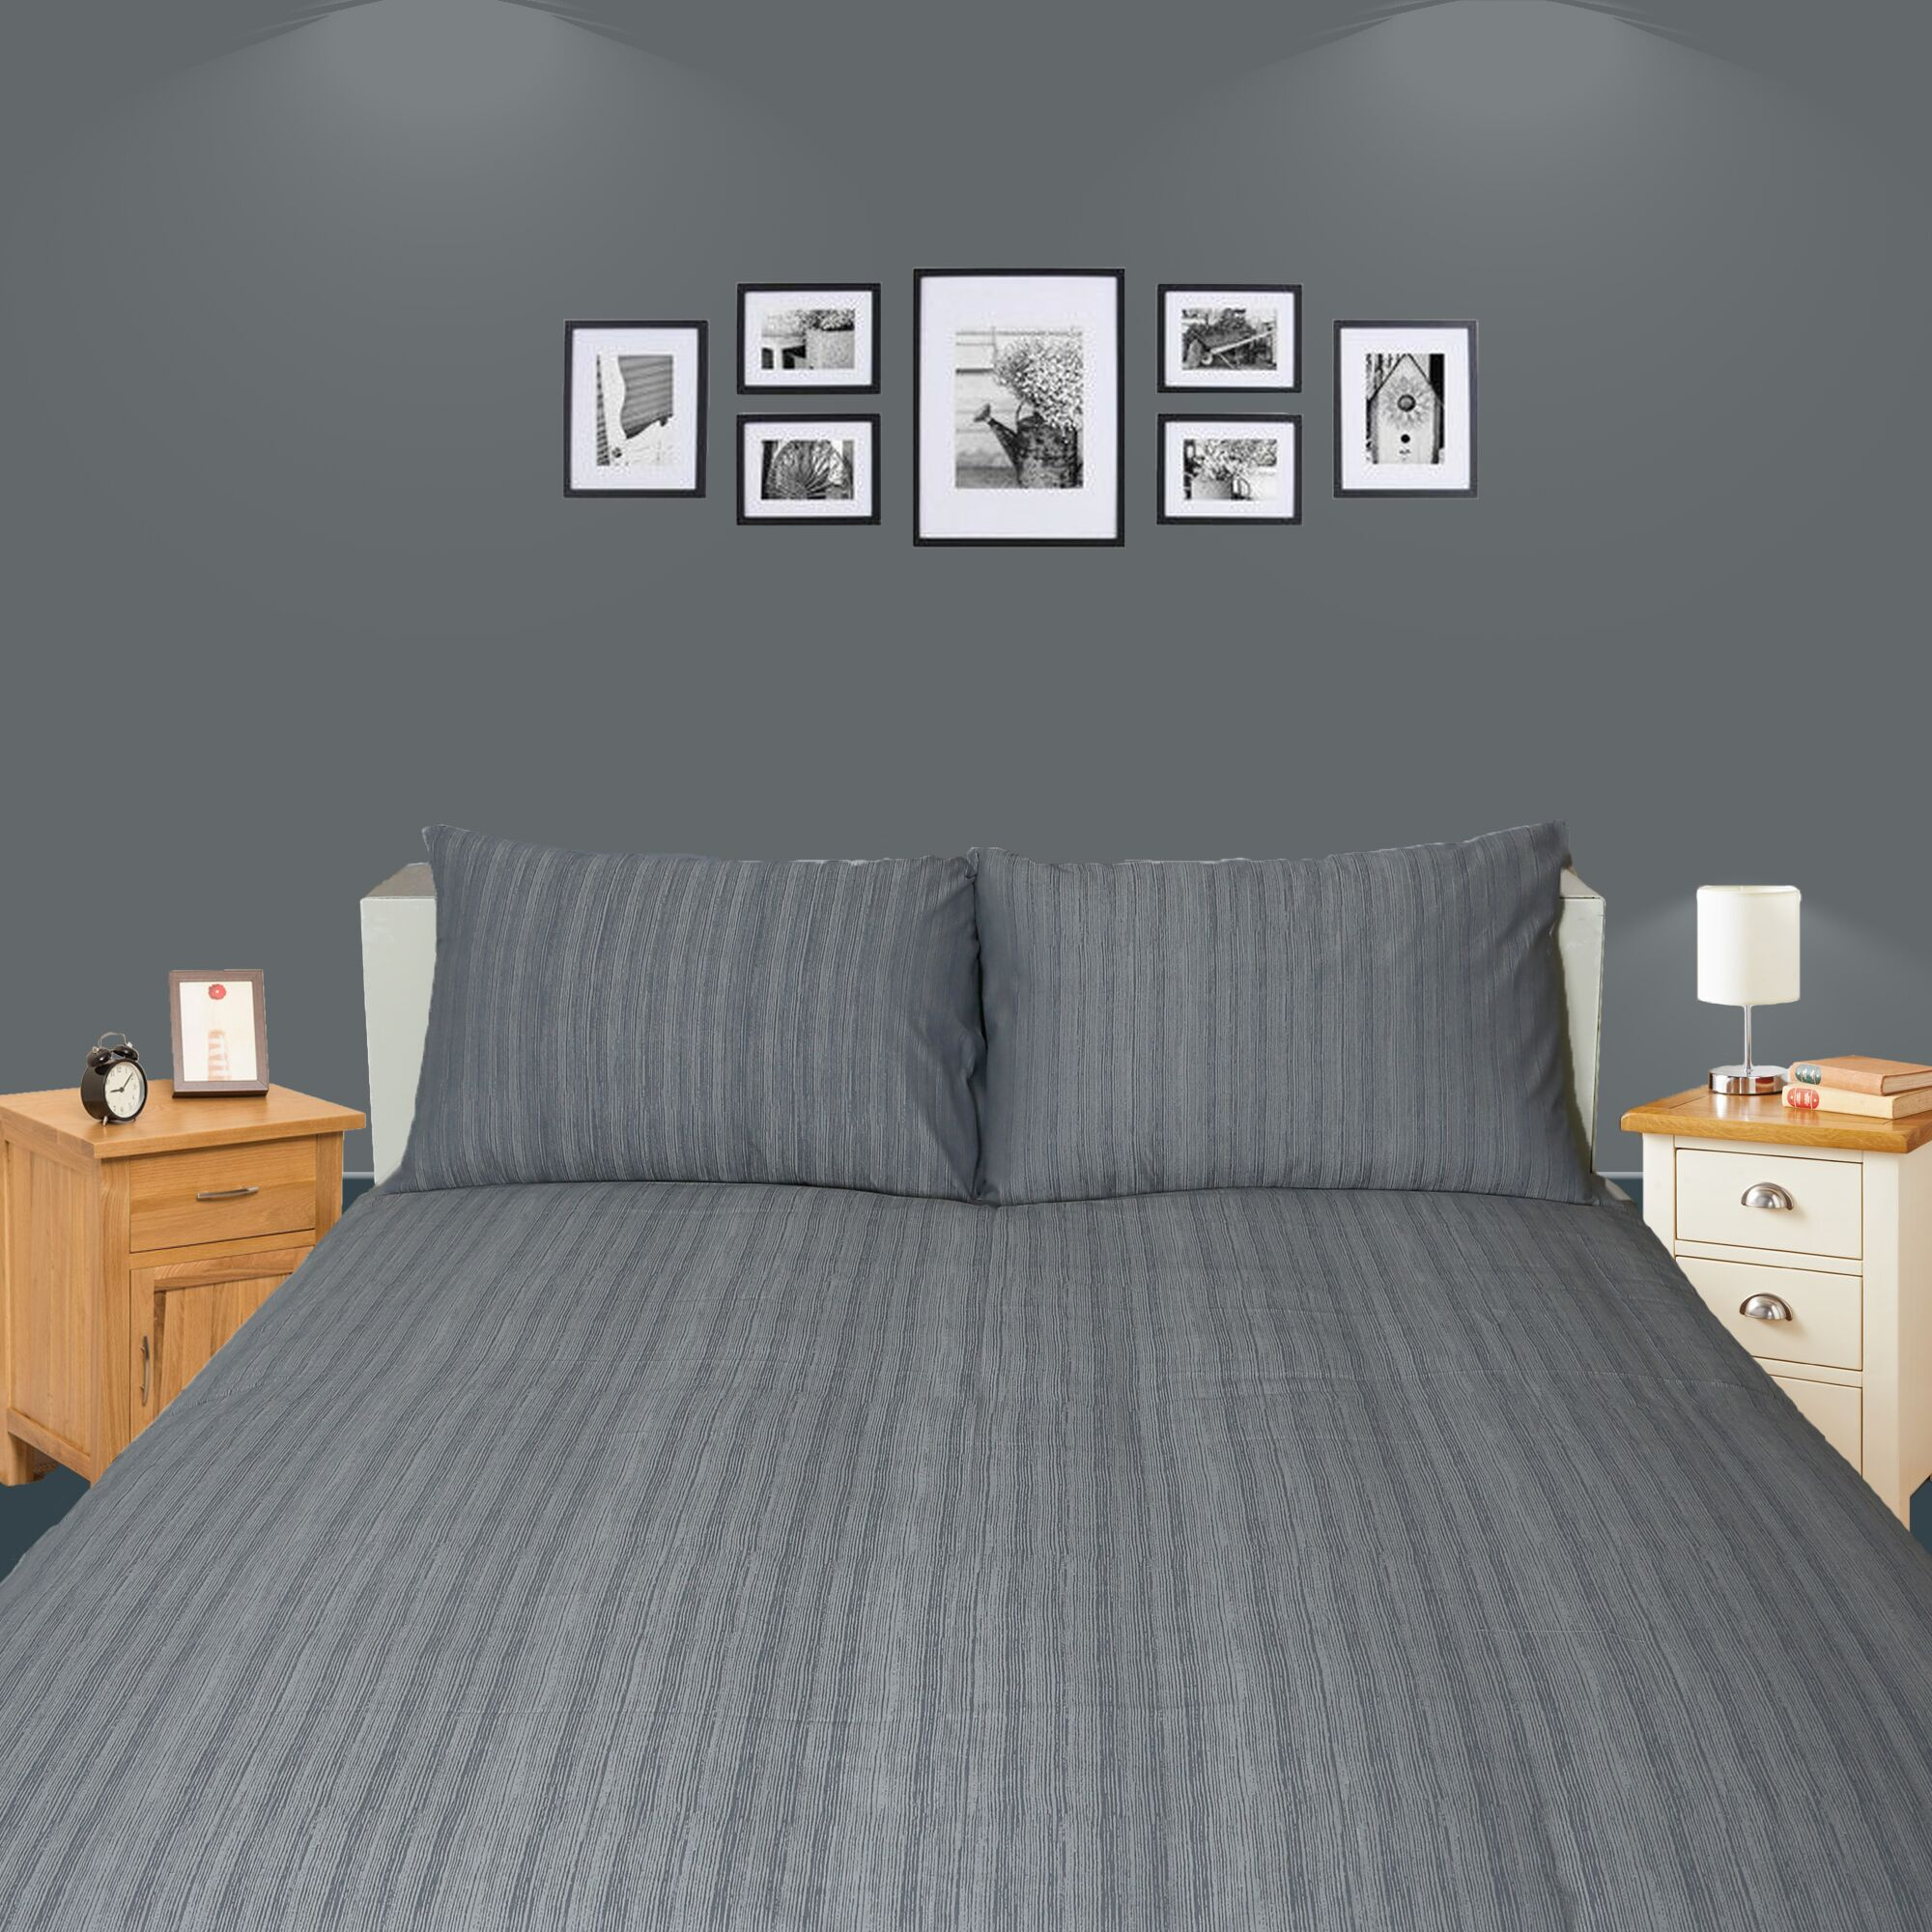 Ingraham Genuine 300 Thread Count 100% Cotton Sheet Set